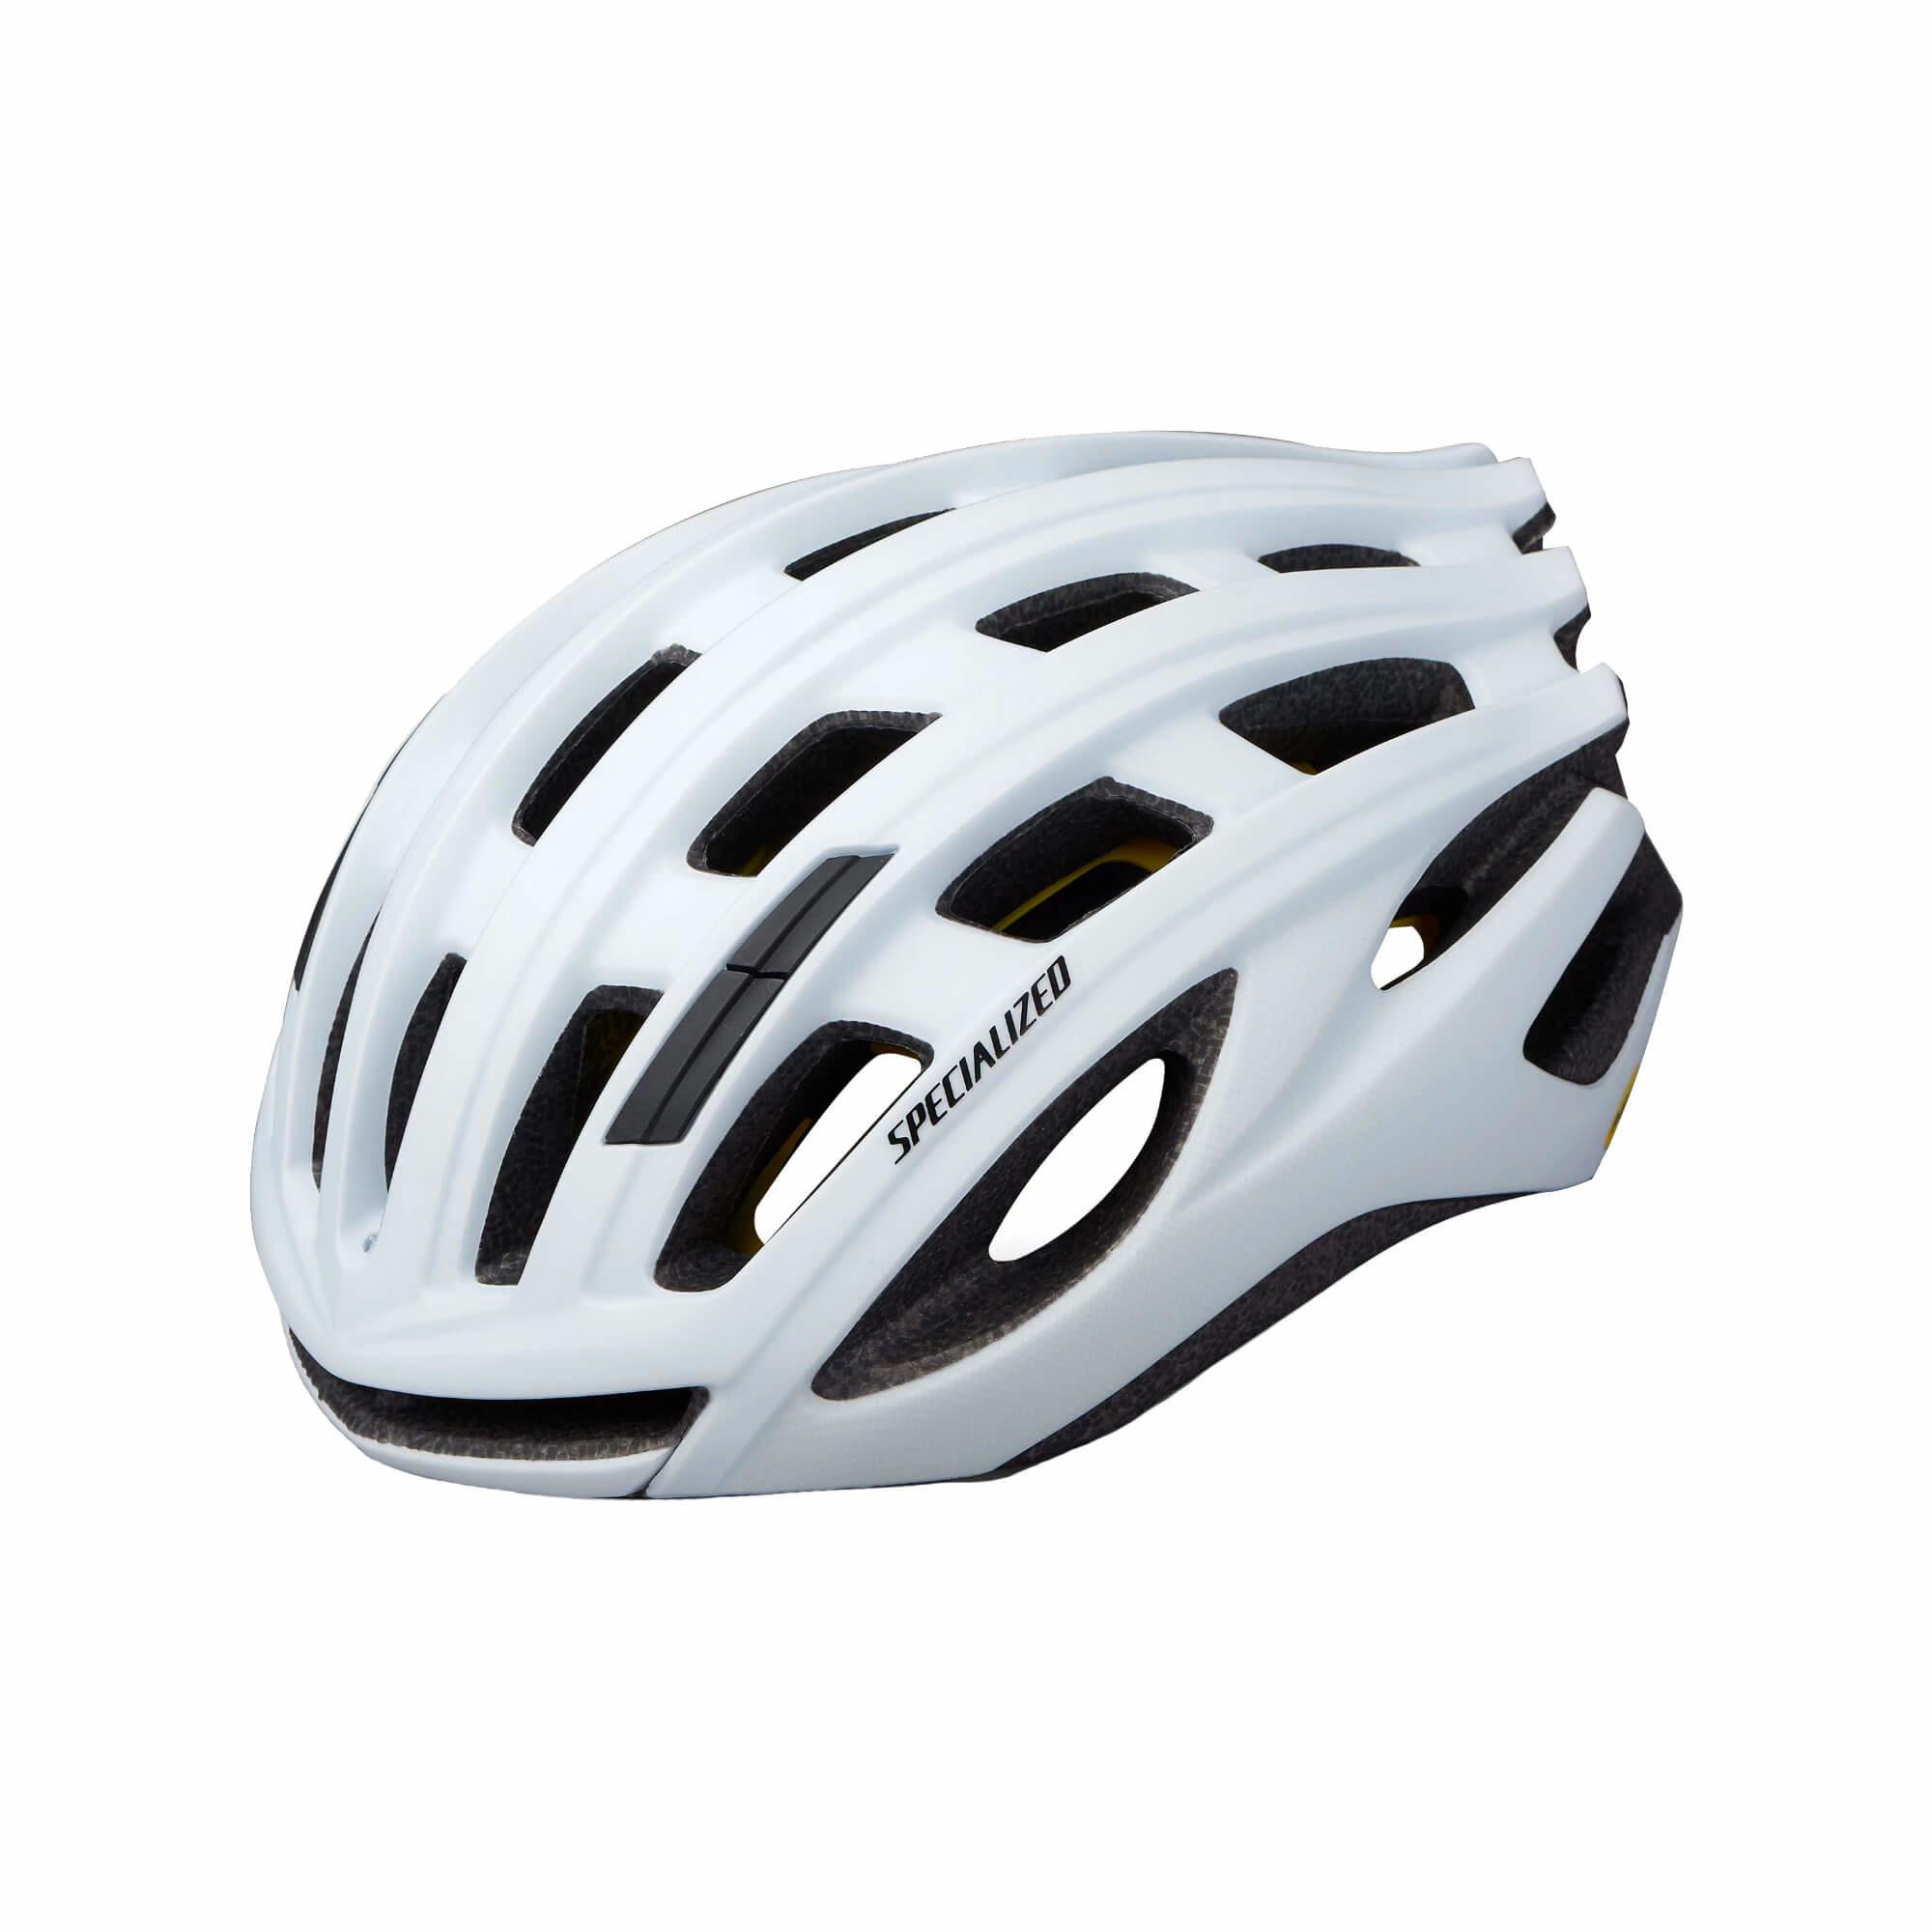 Propero 3 Helmet Angi Mips-2